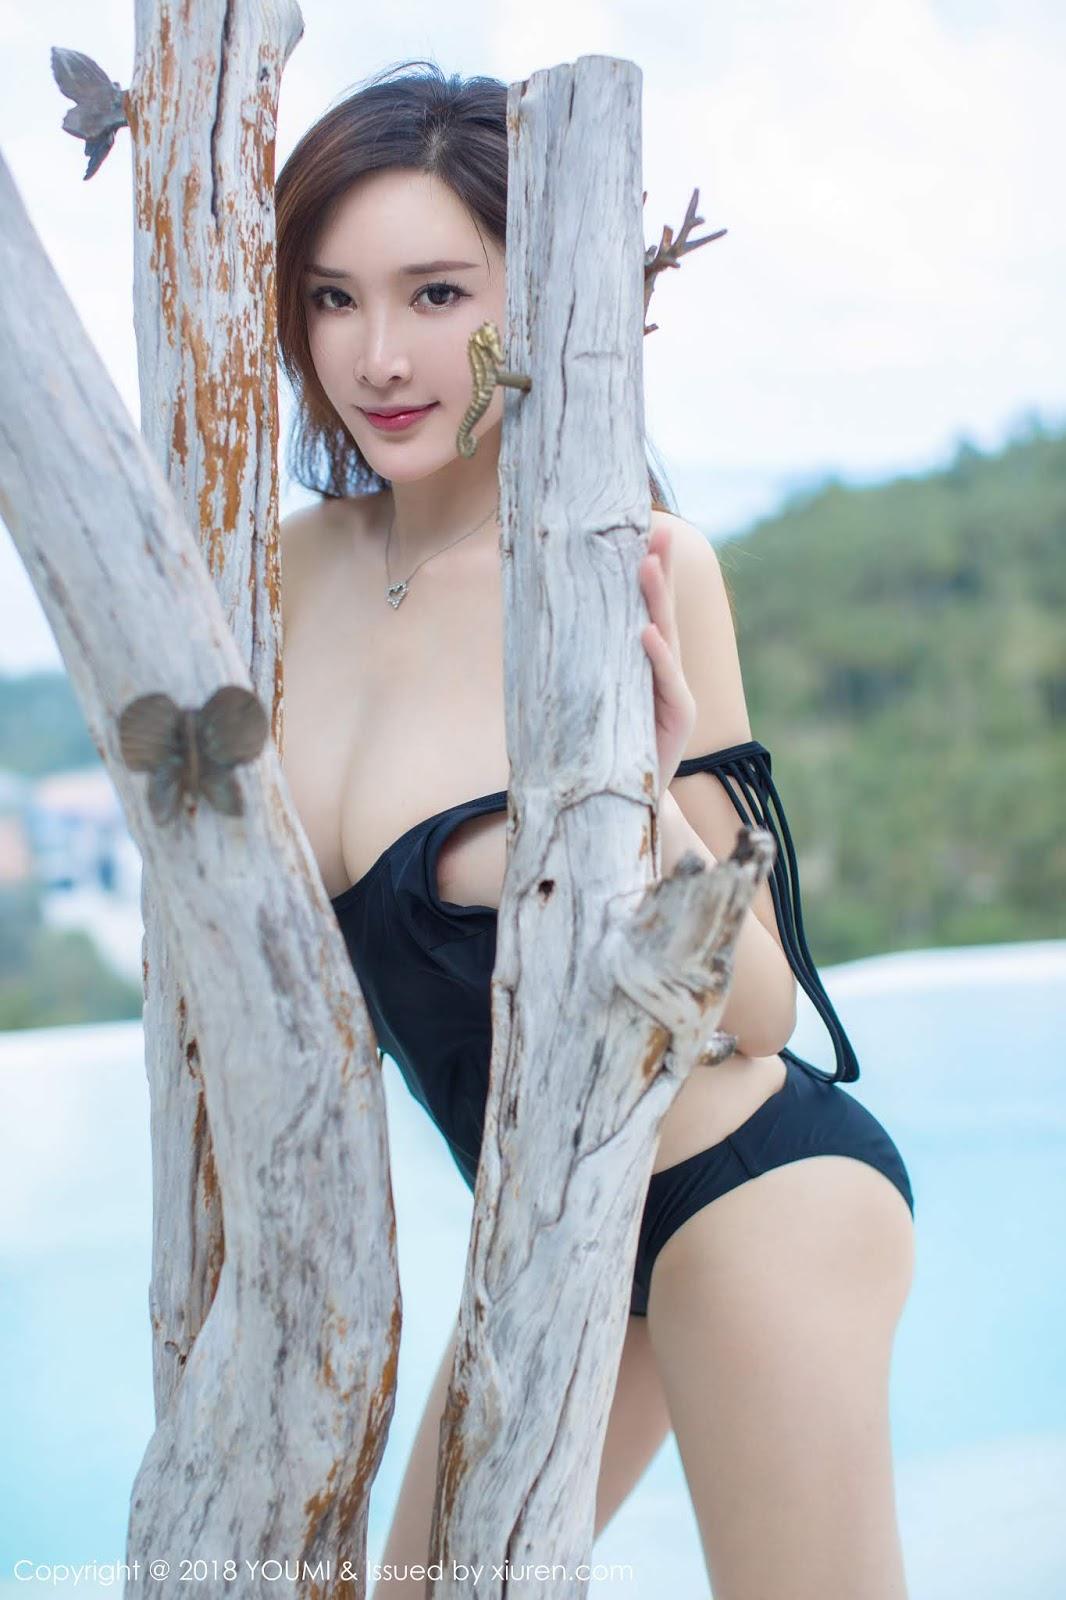 [YouMi] Vol.173 Tu Fei Yuan Ai Cuo Qiong 土肥圆矮挫穷 - Ảnh đẹp